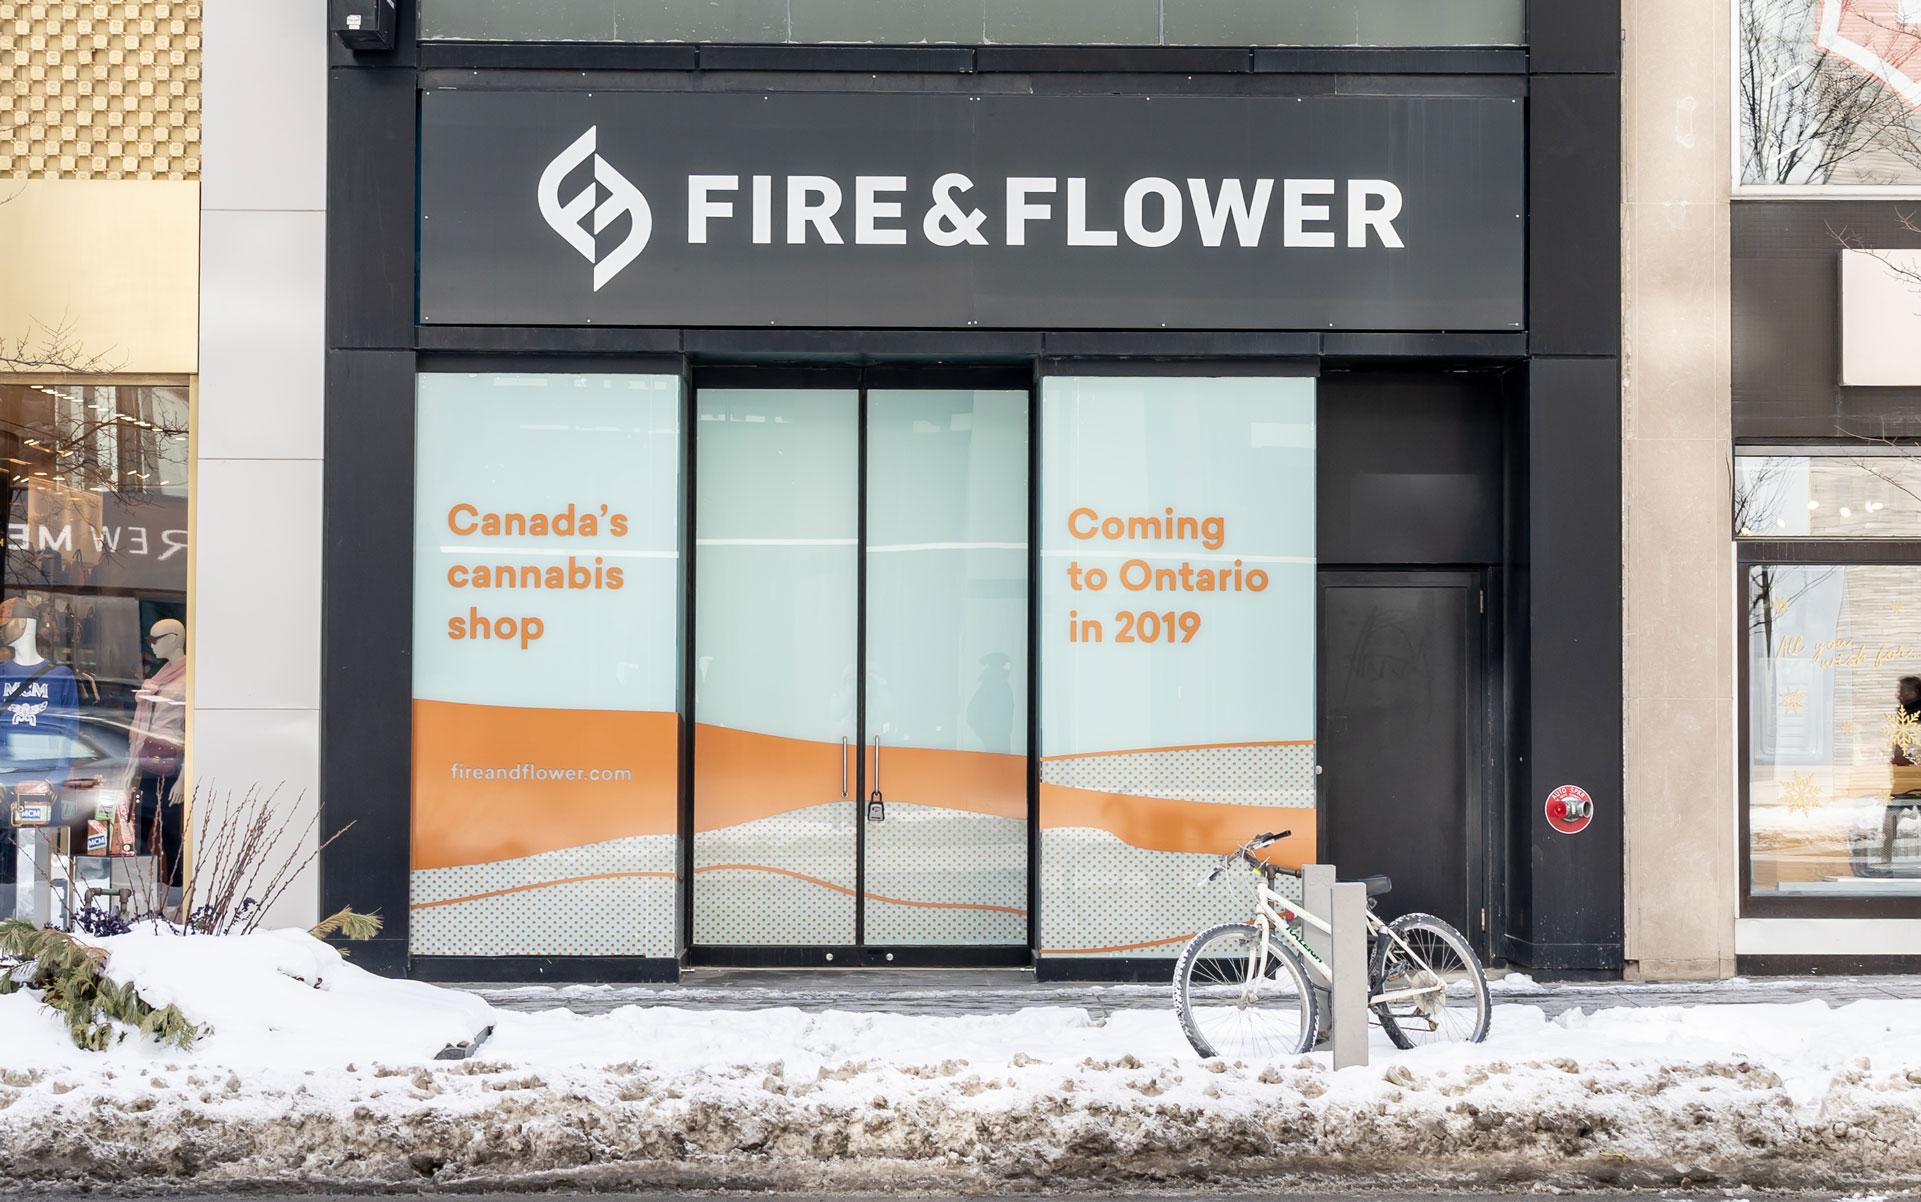 ontario retail fire & flower